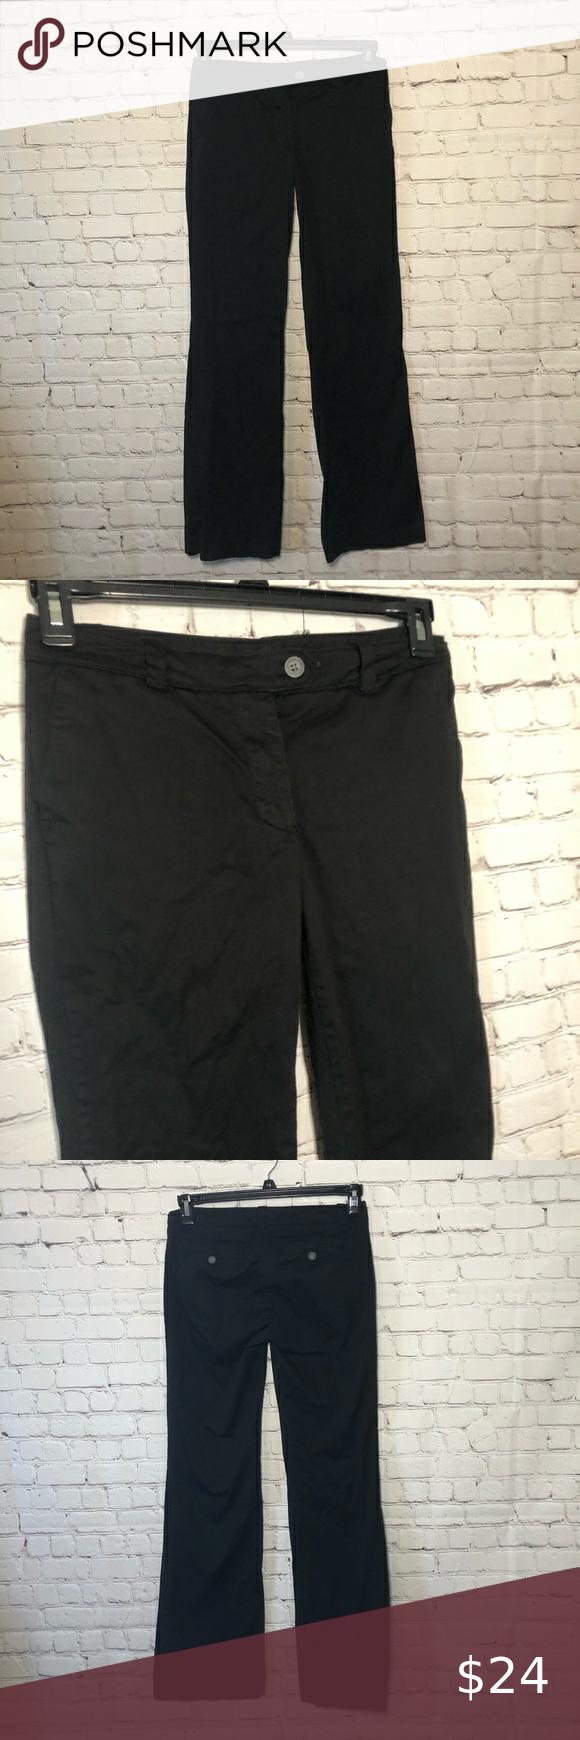 New York Co Tall Black Slacks Dress Pants Black Slacks Dress Pants Slacks [ 1740 x 580 Pixel ]